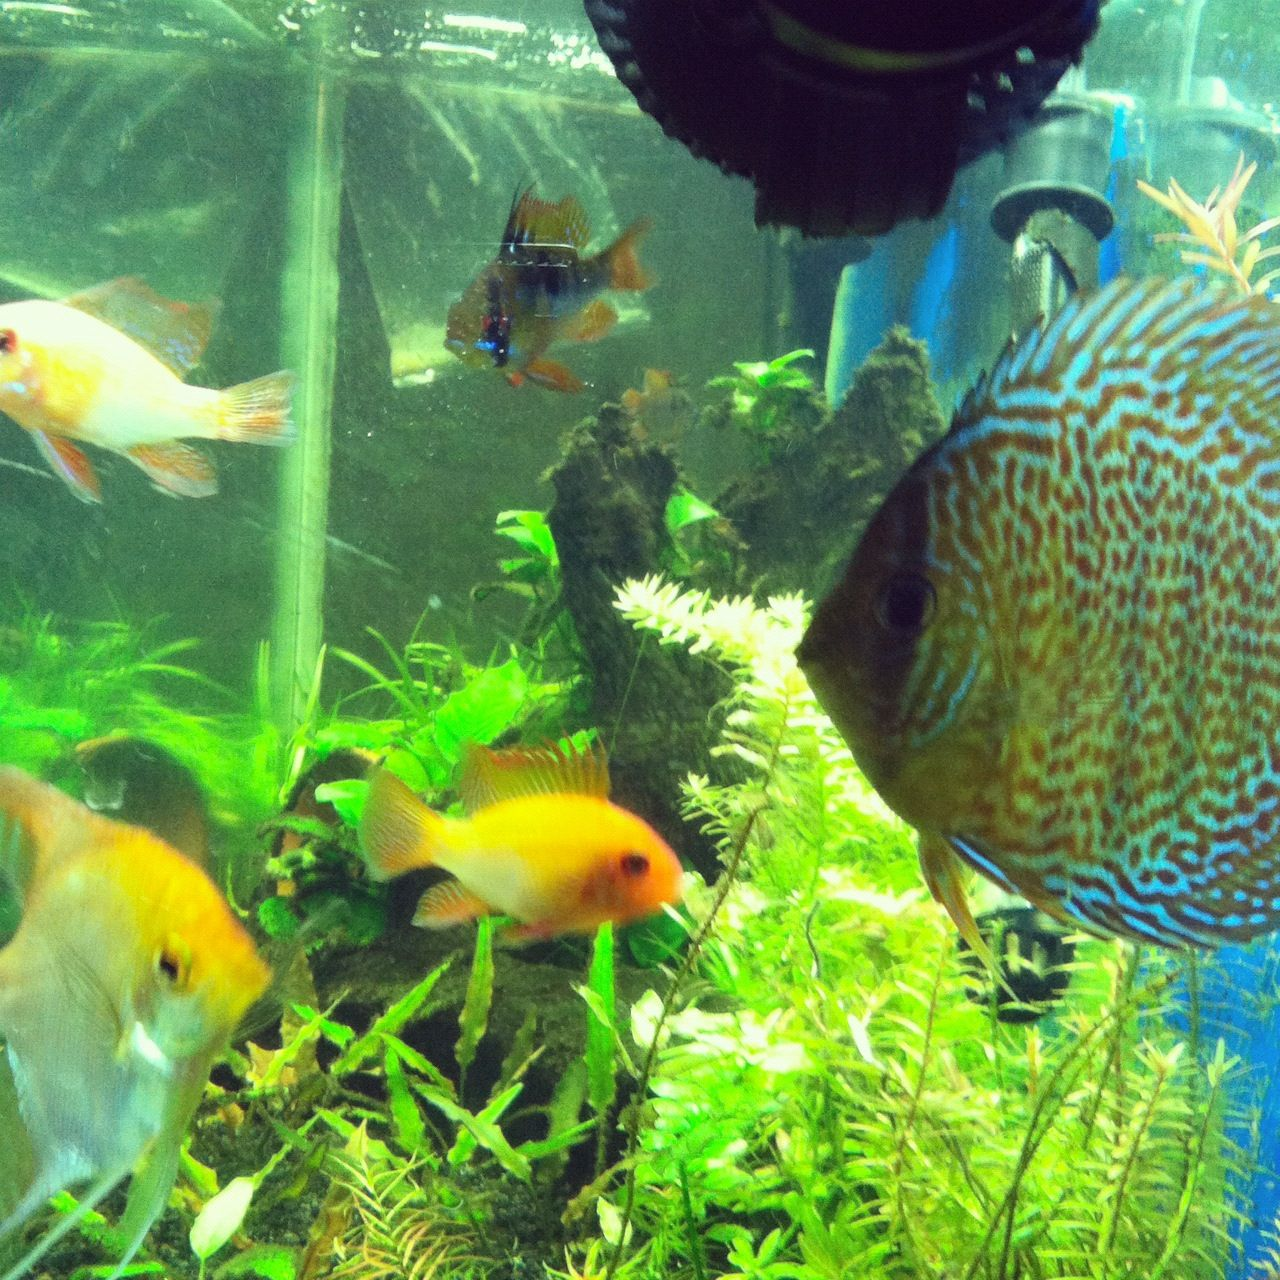 Fish Discus And German Blue Rams With A Angle Fish Andi S Fish Tank Yay Discus Aquarium Tropical Fish Freshwater Aquarium